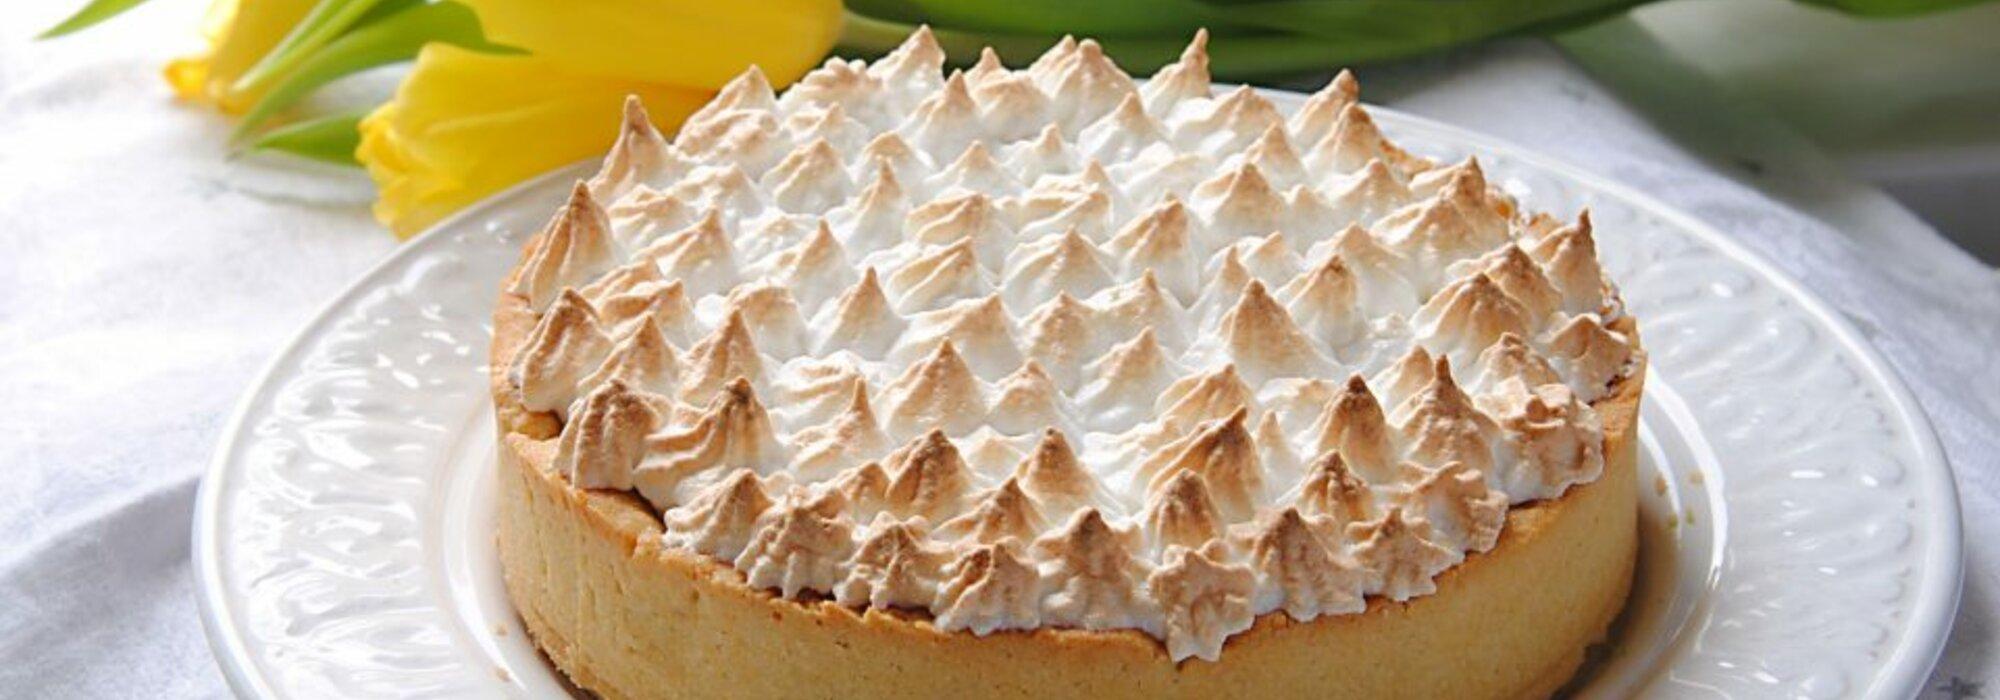 Koolhydraatarme citroen meringue taart